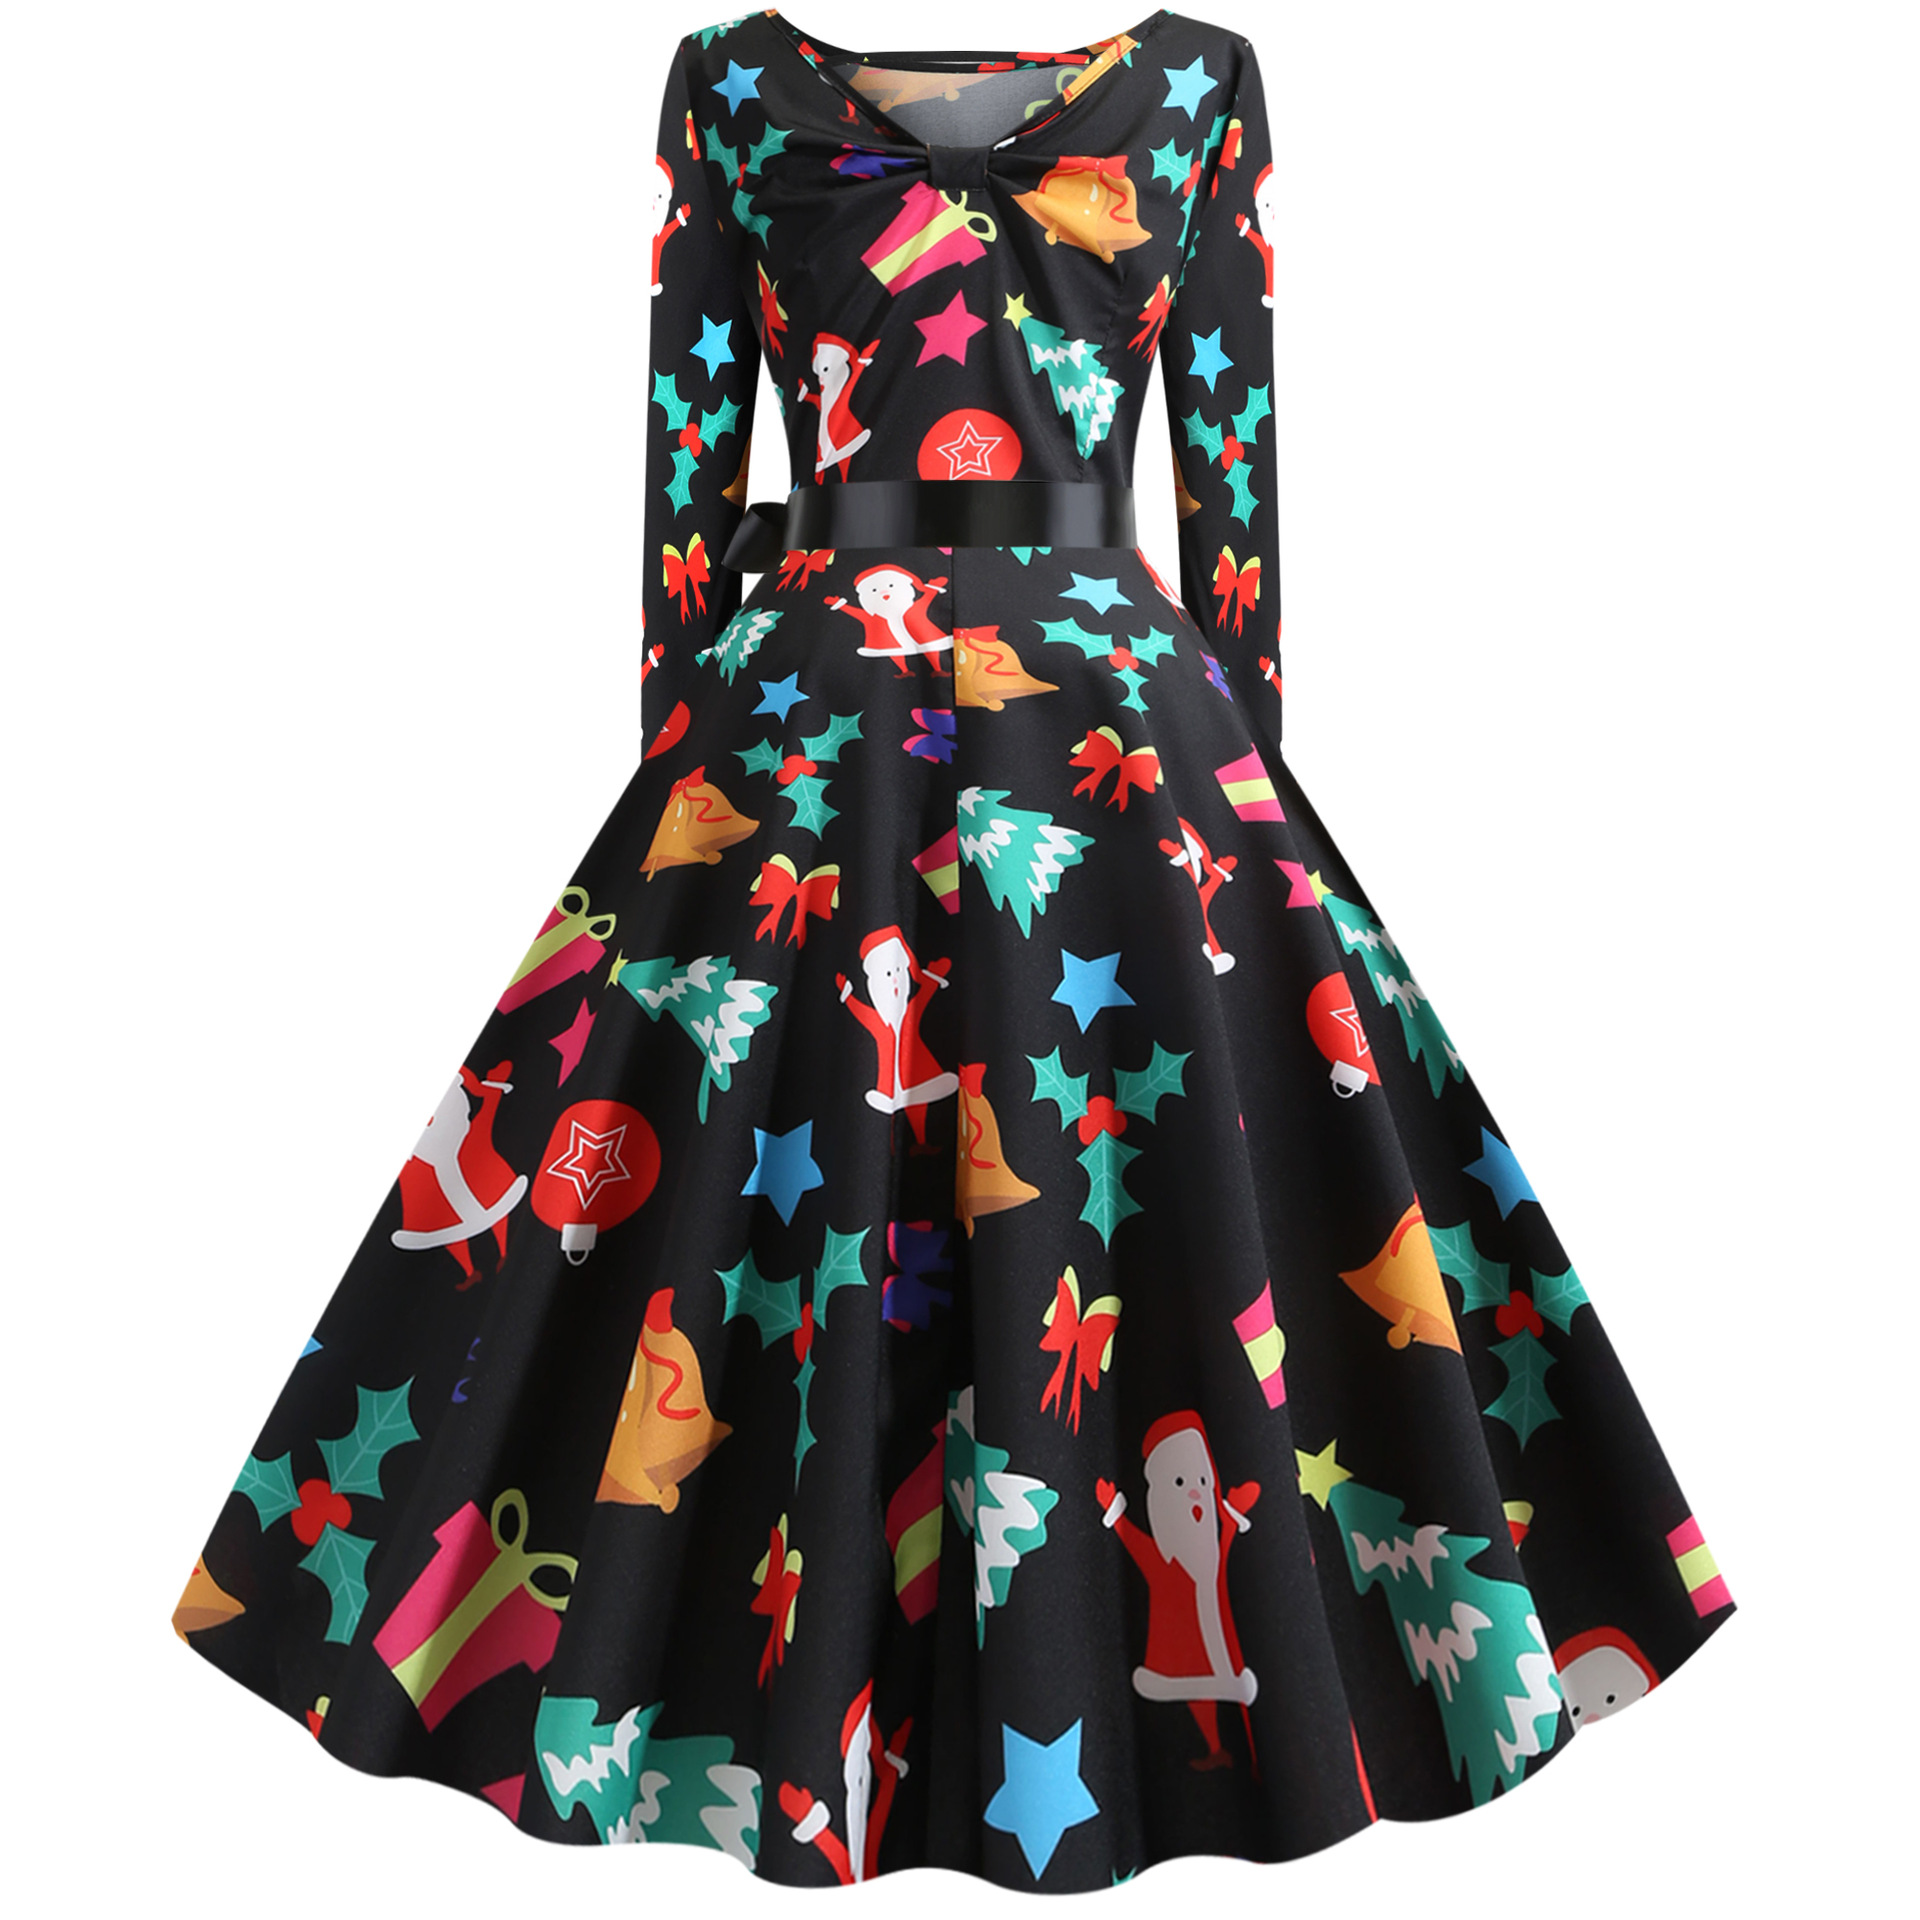 christmas tree dress vintage women plus size dresses party women clothes 2019 print sexy dresses party night club